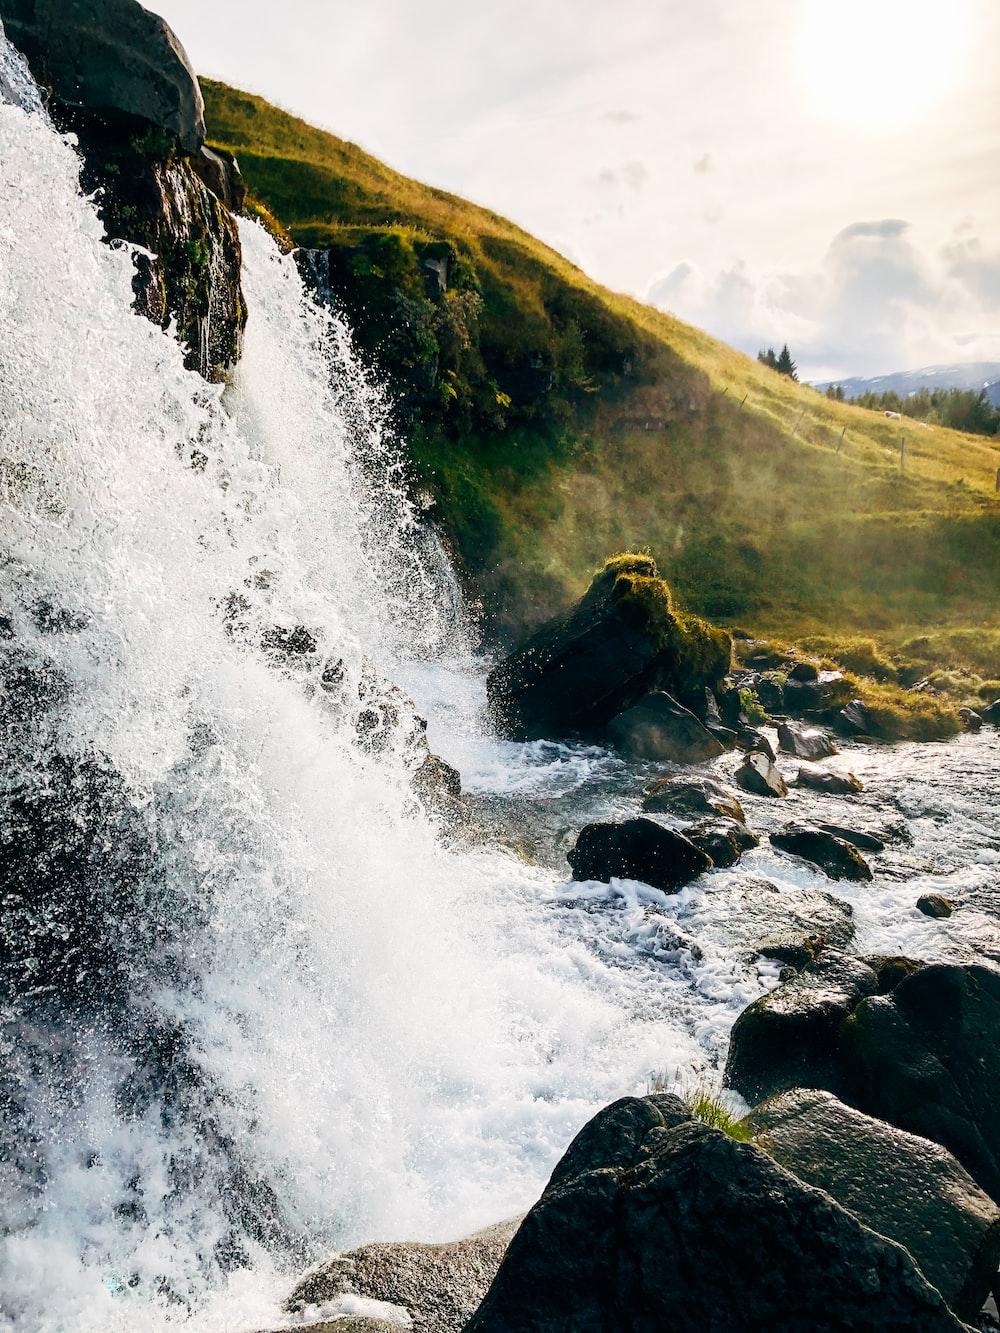 20+ River Pictures | Download Free Images on Unsplash